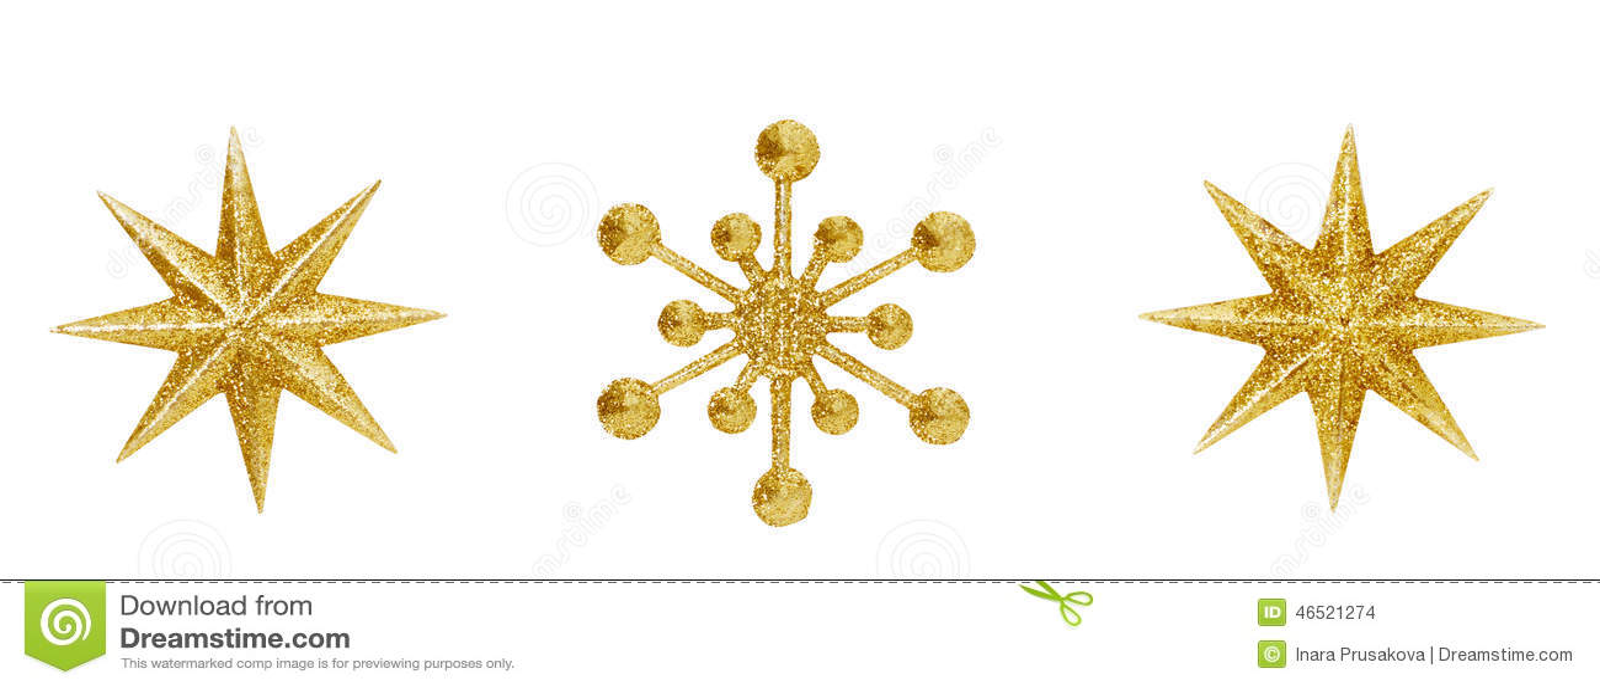 Christmas Snowflake Star Hanging Decoration Xmas Toys